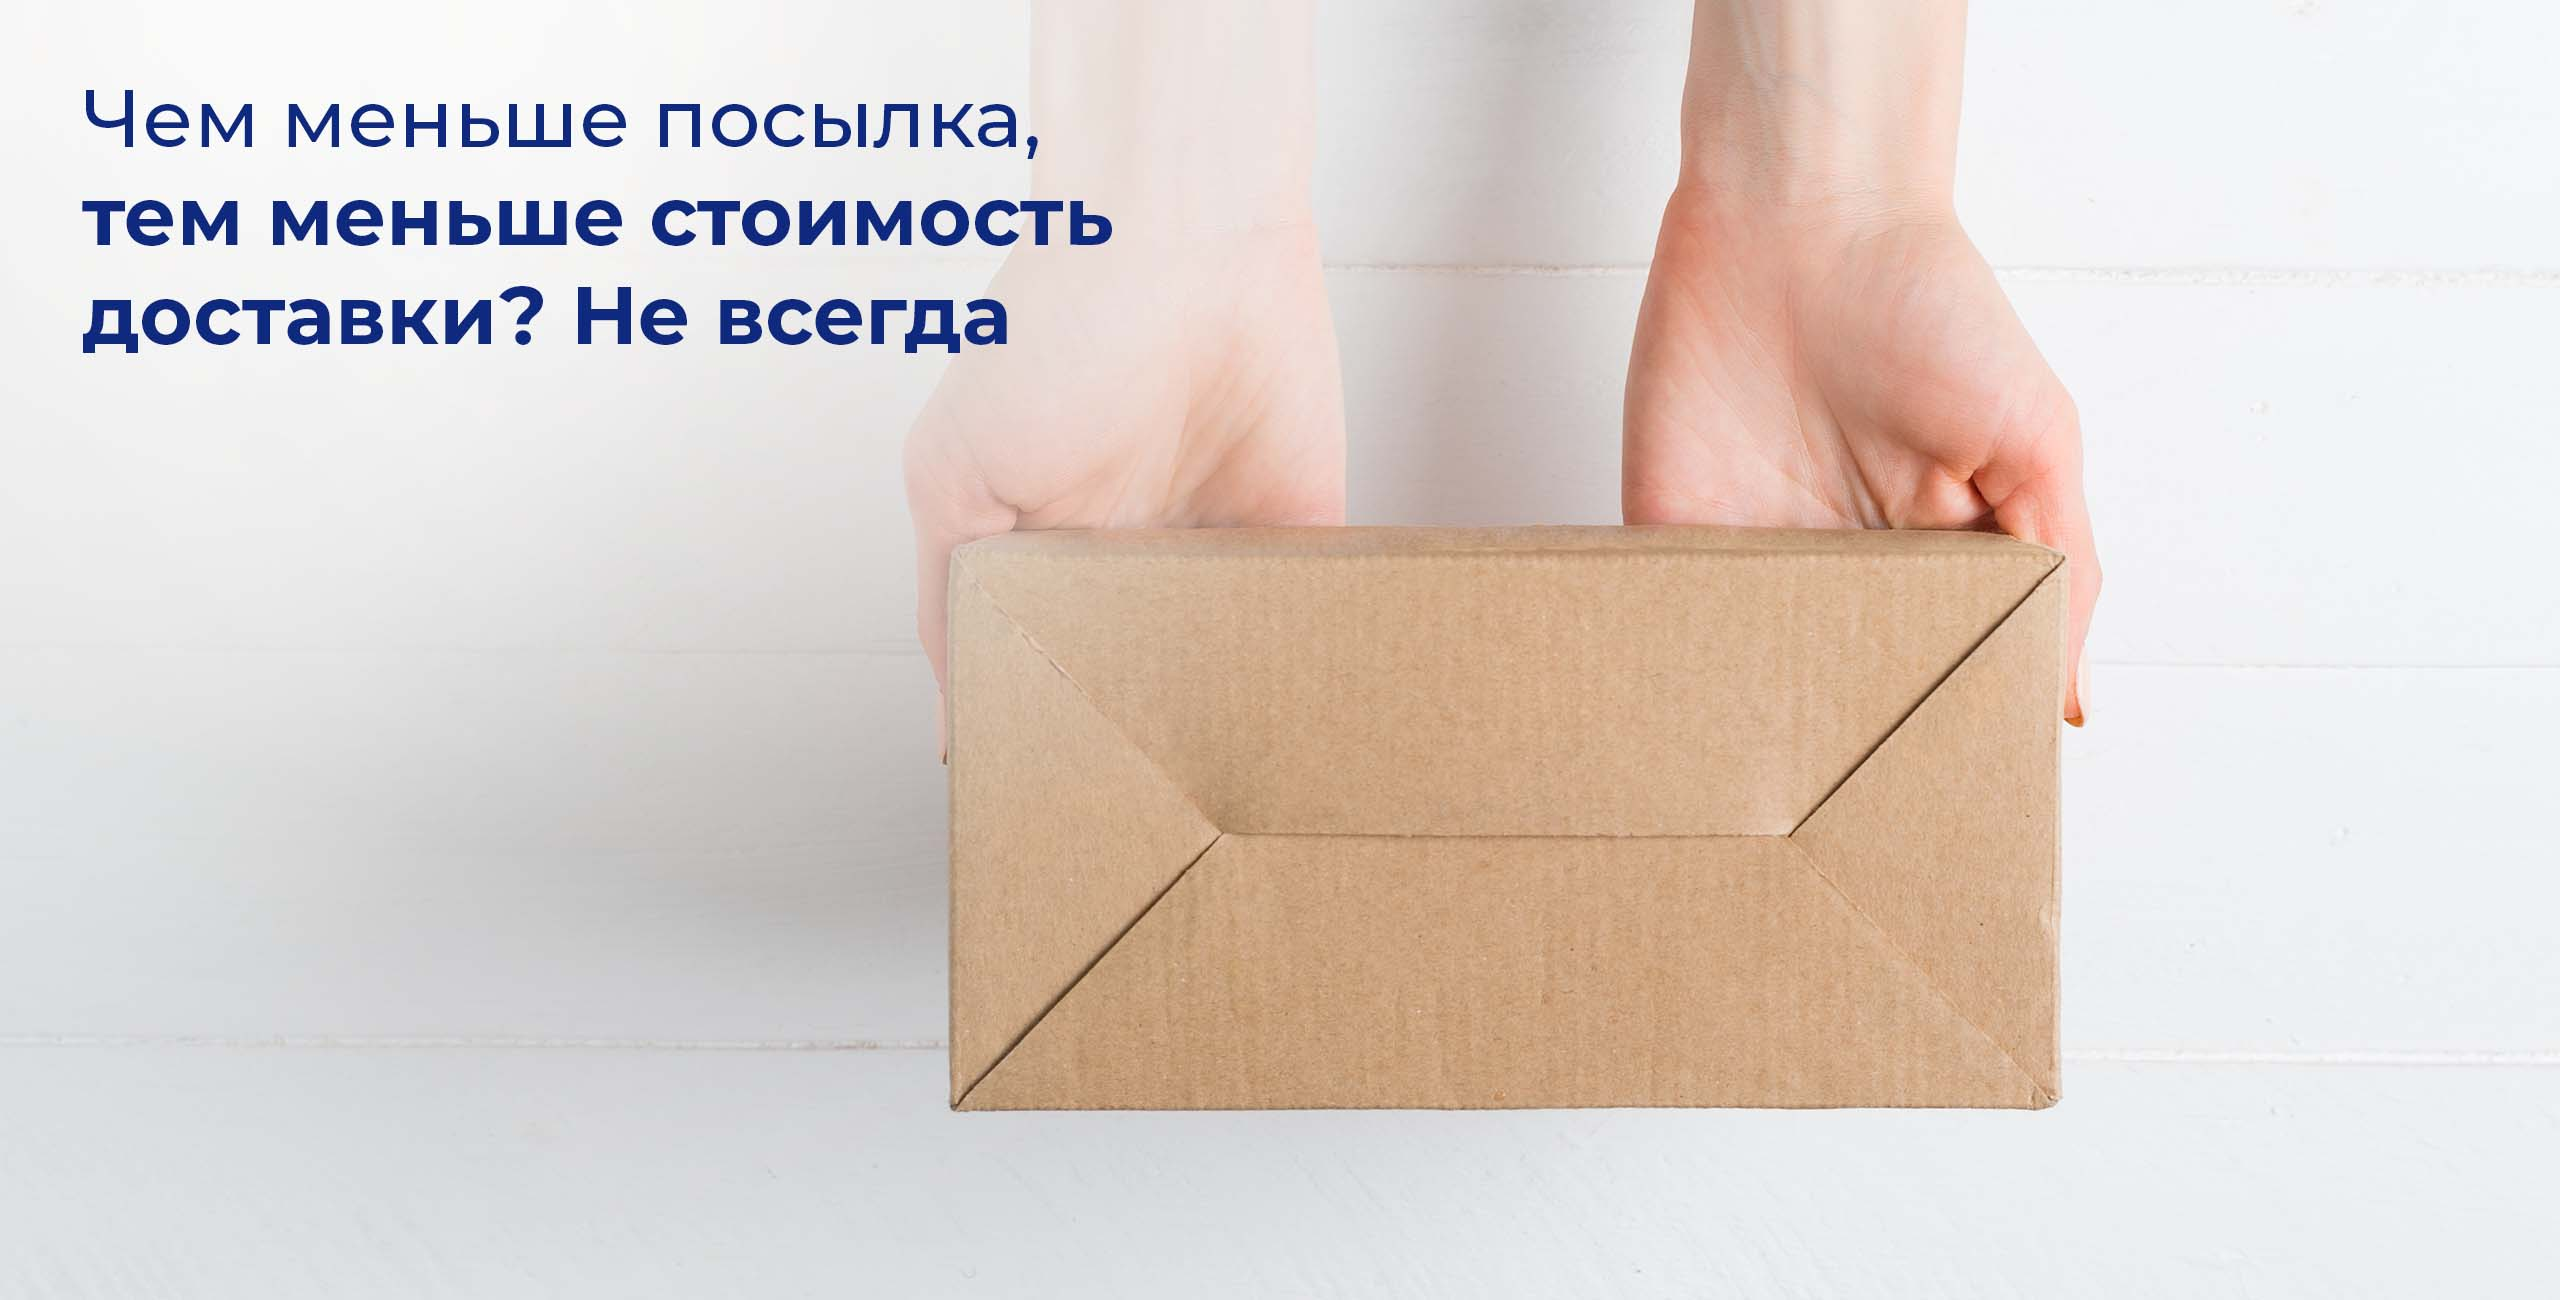 Отправка посылки за границу